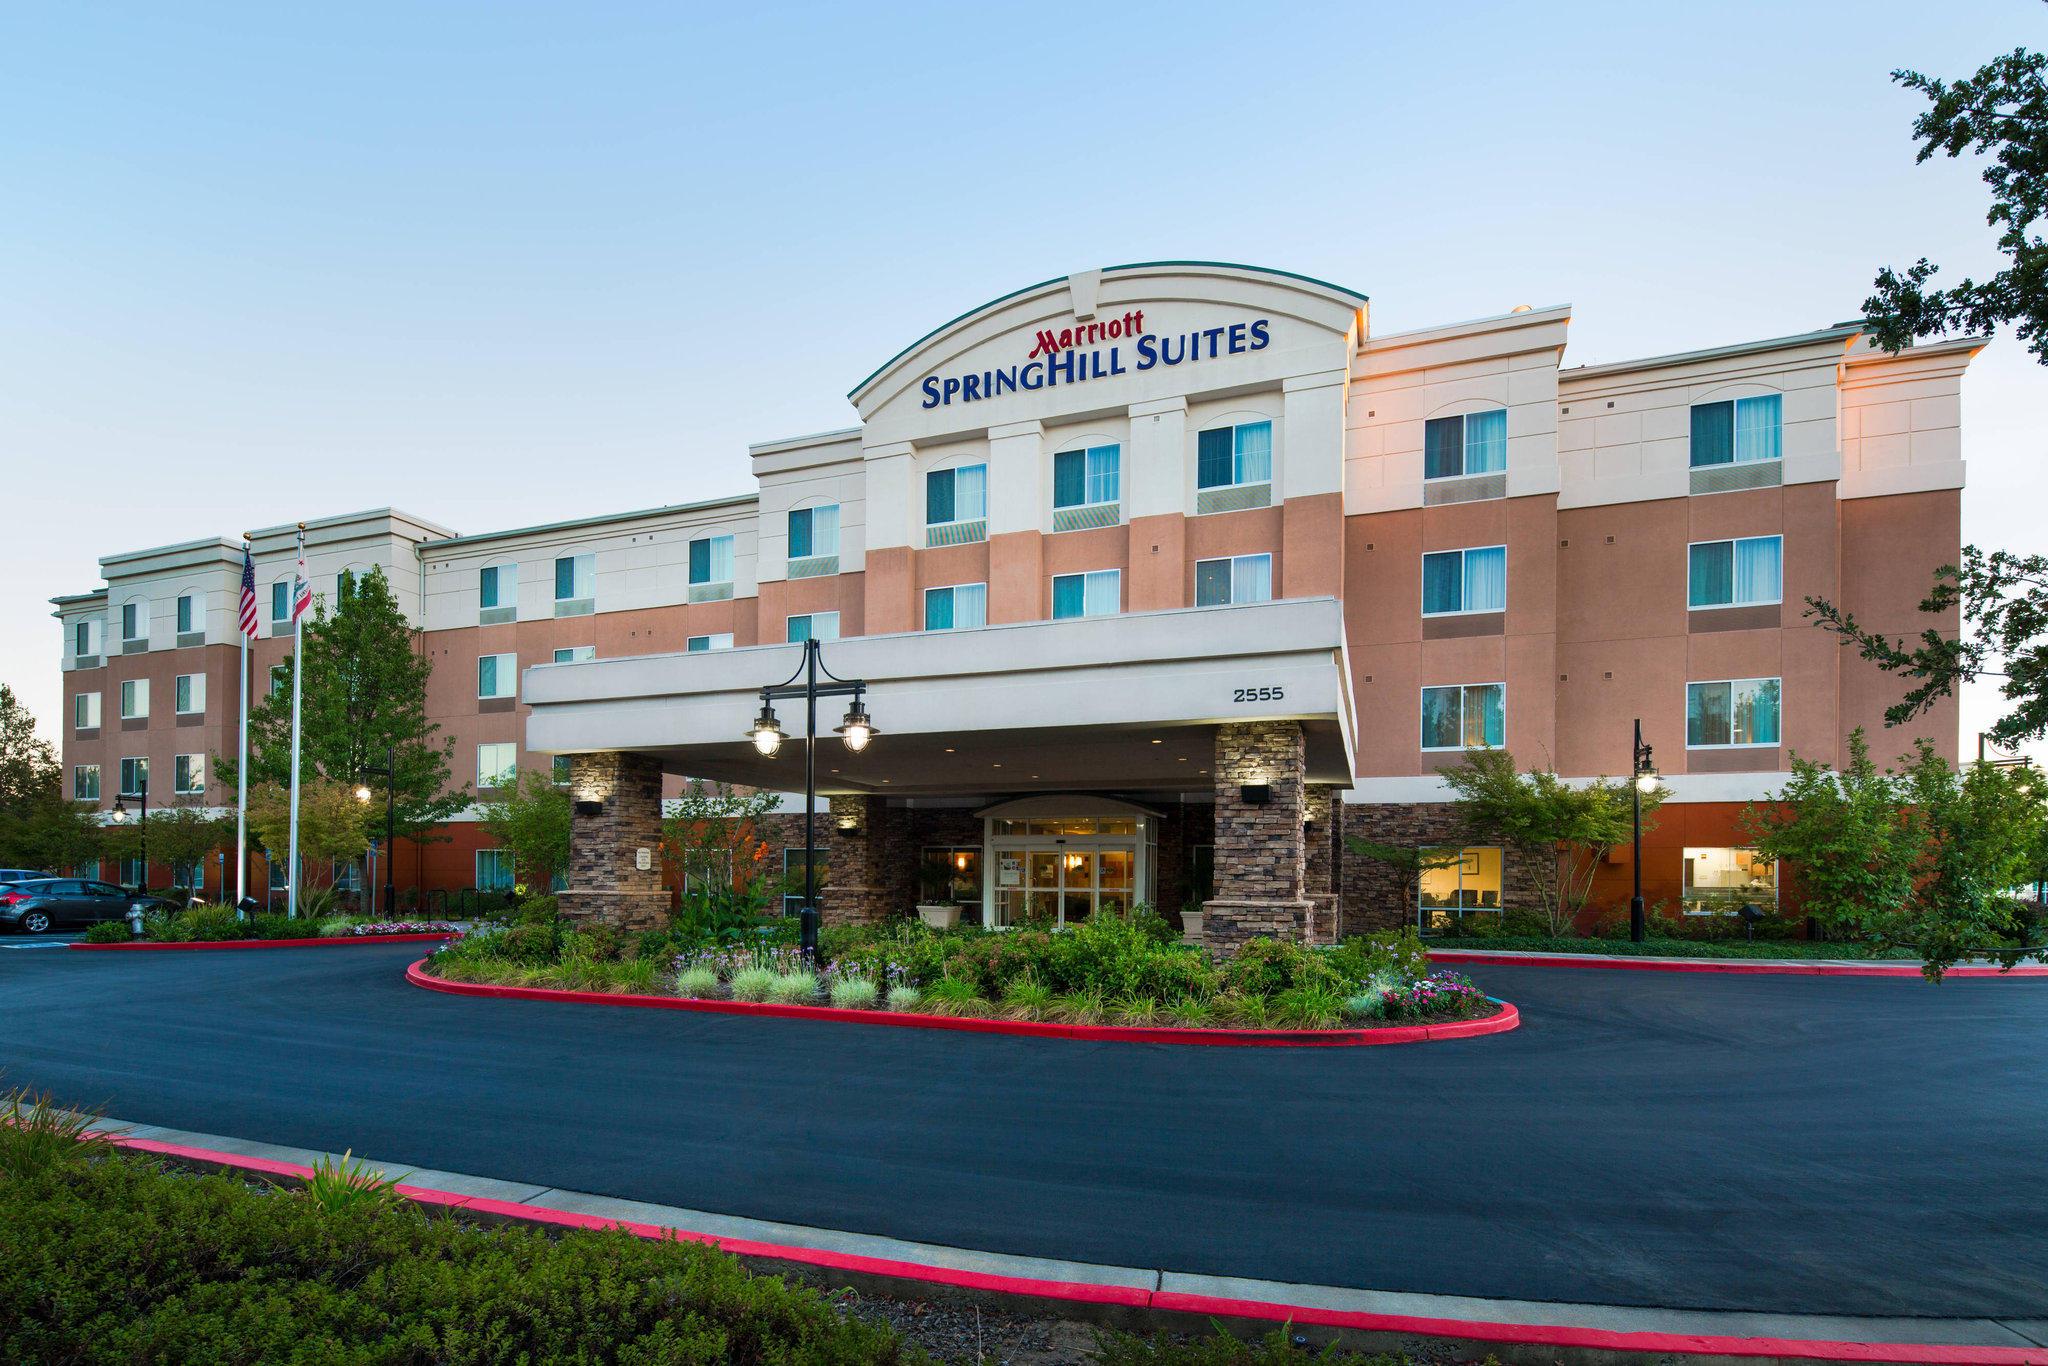 SpringHill Suites by Marriott Sacramento Natomas